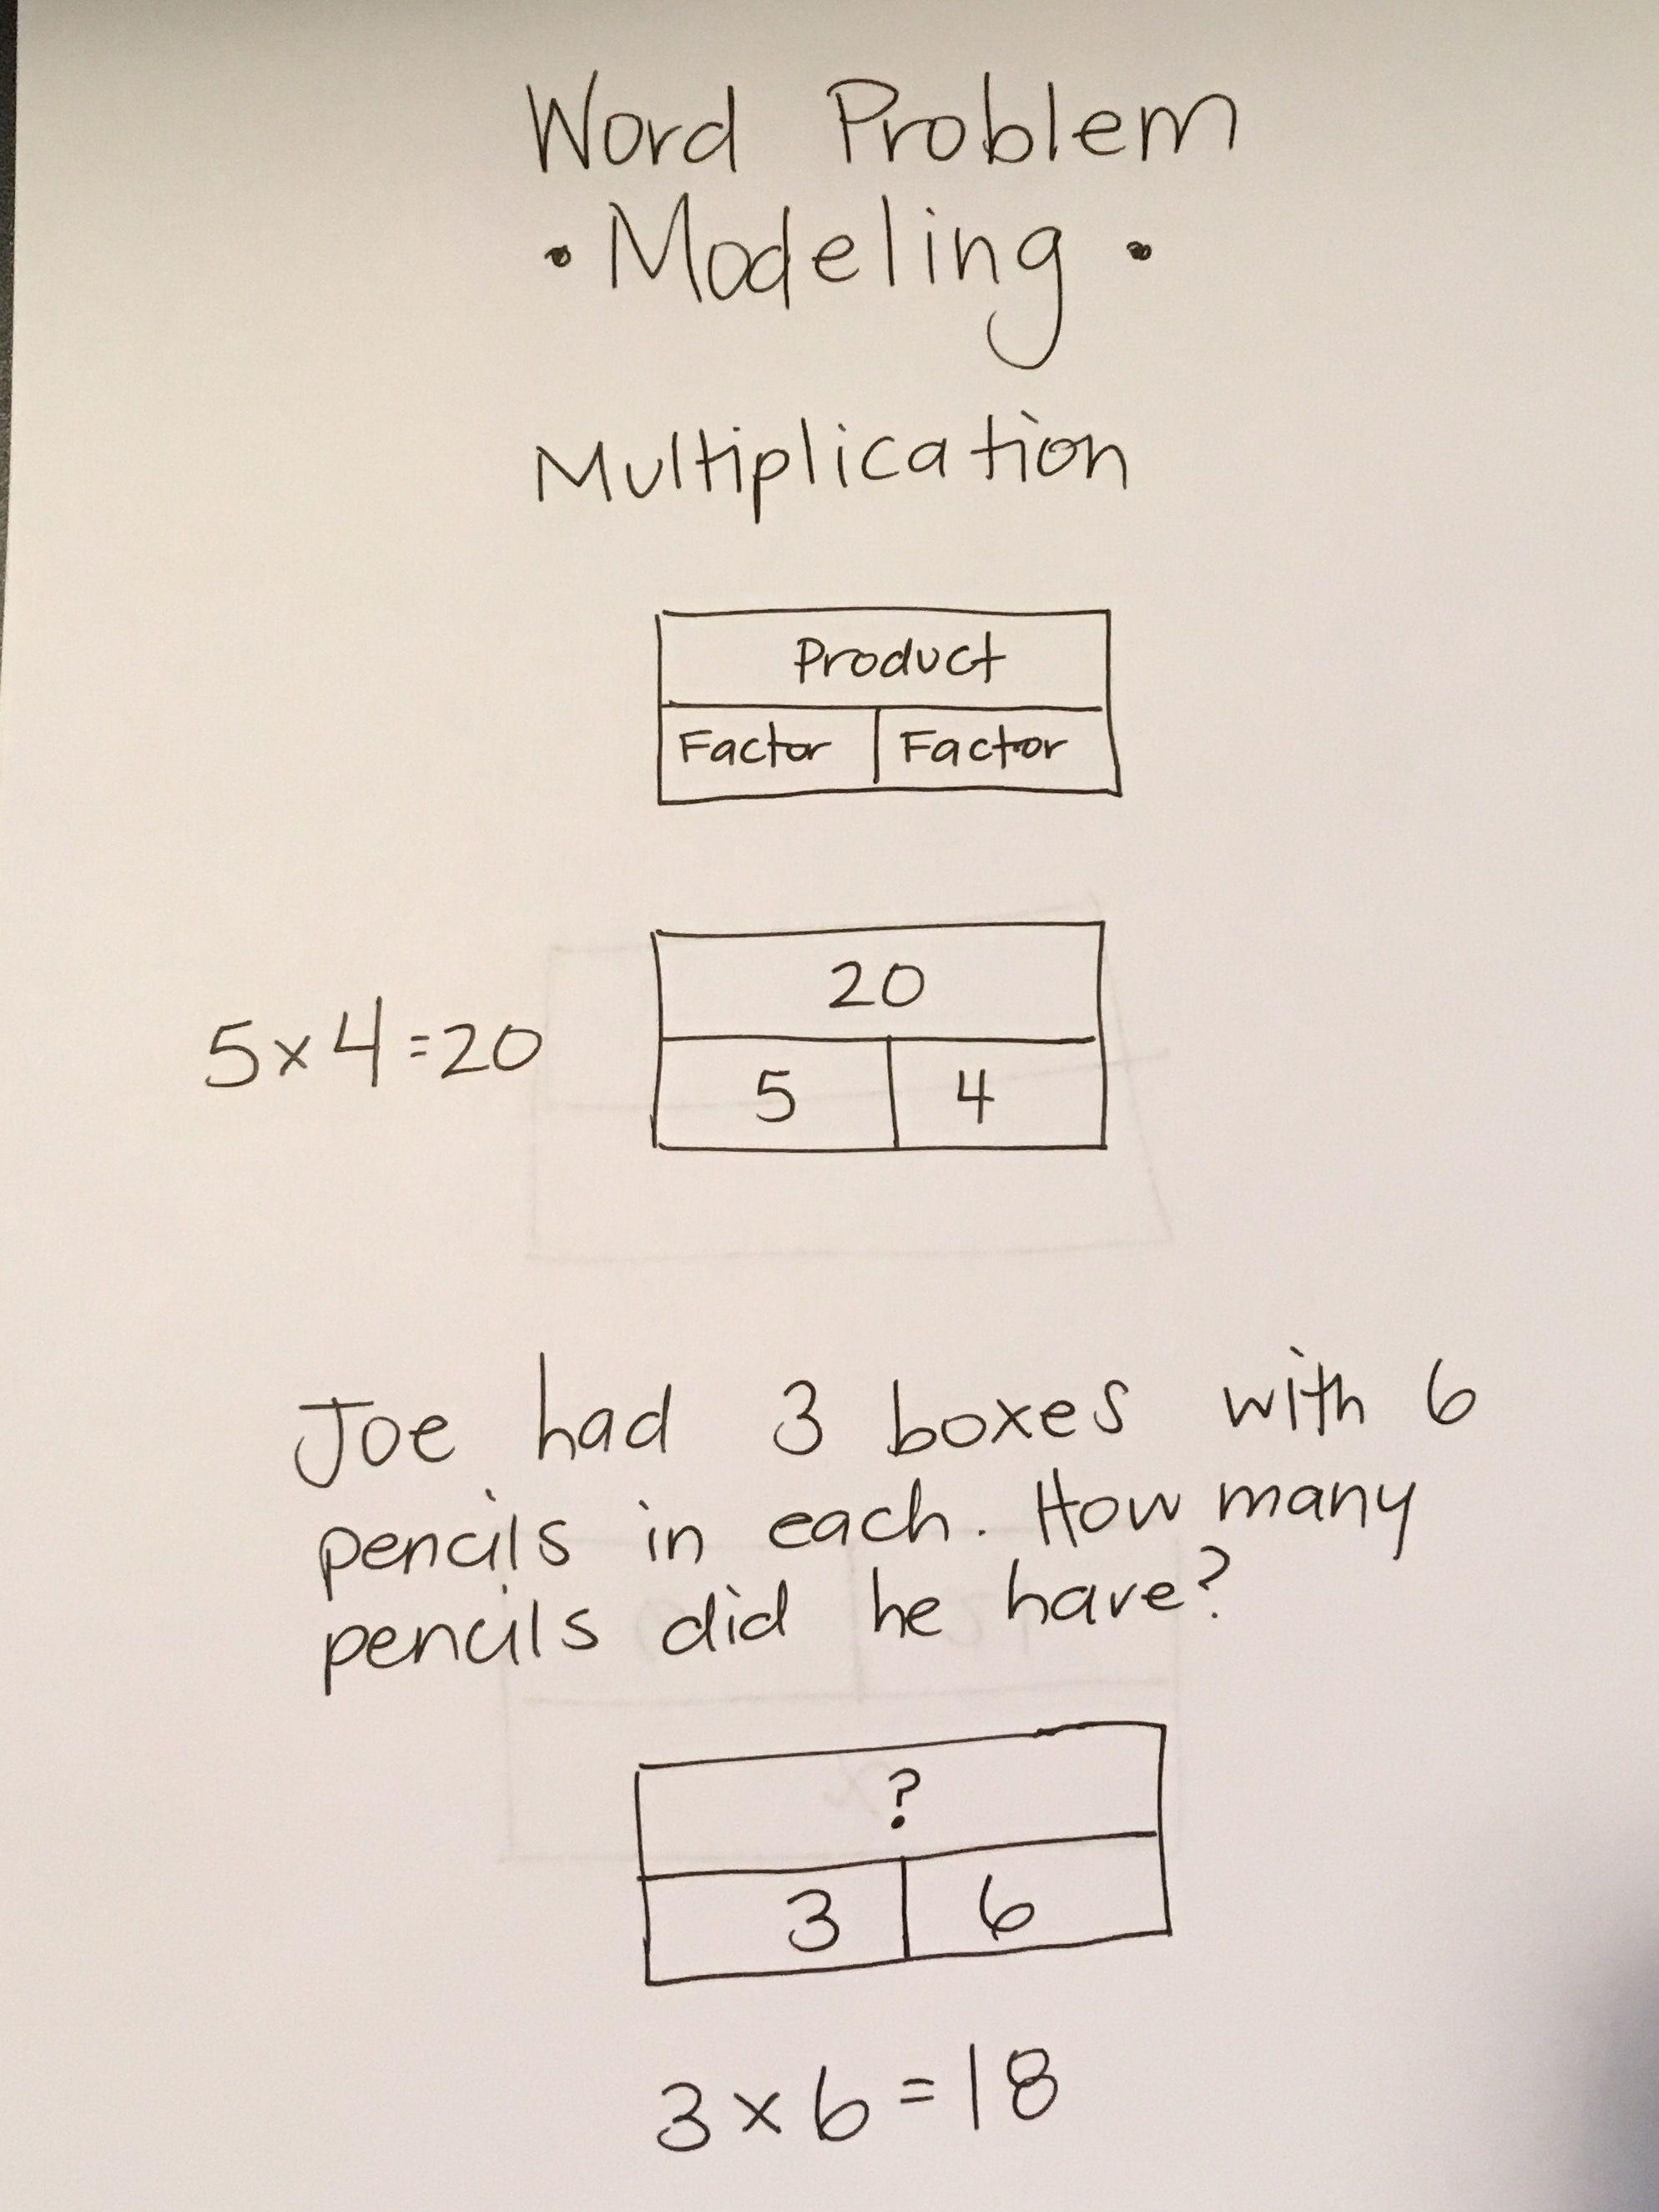 Part Part Whole Models For Multiplication